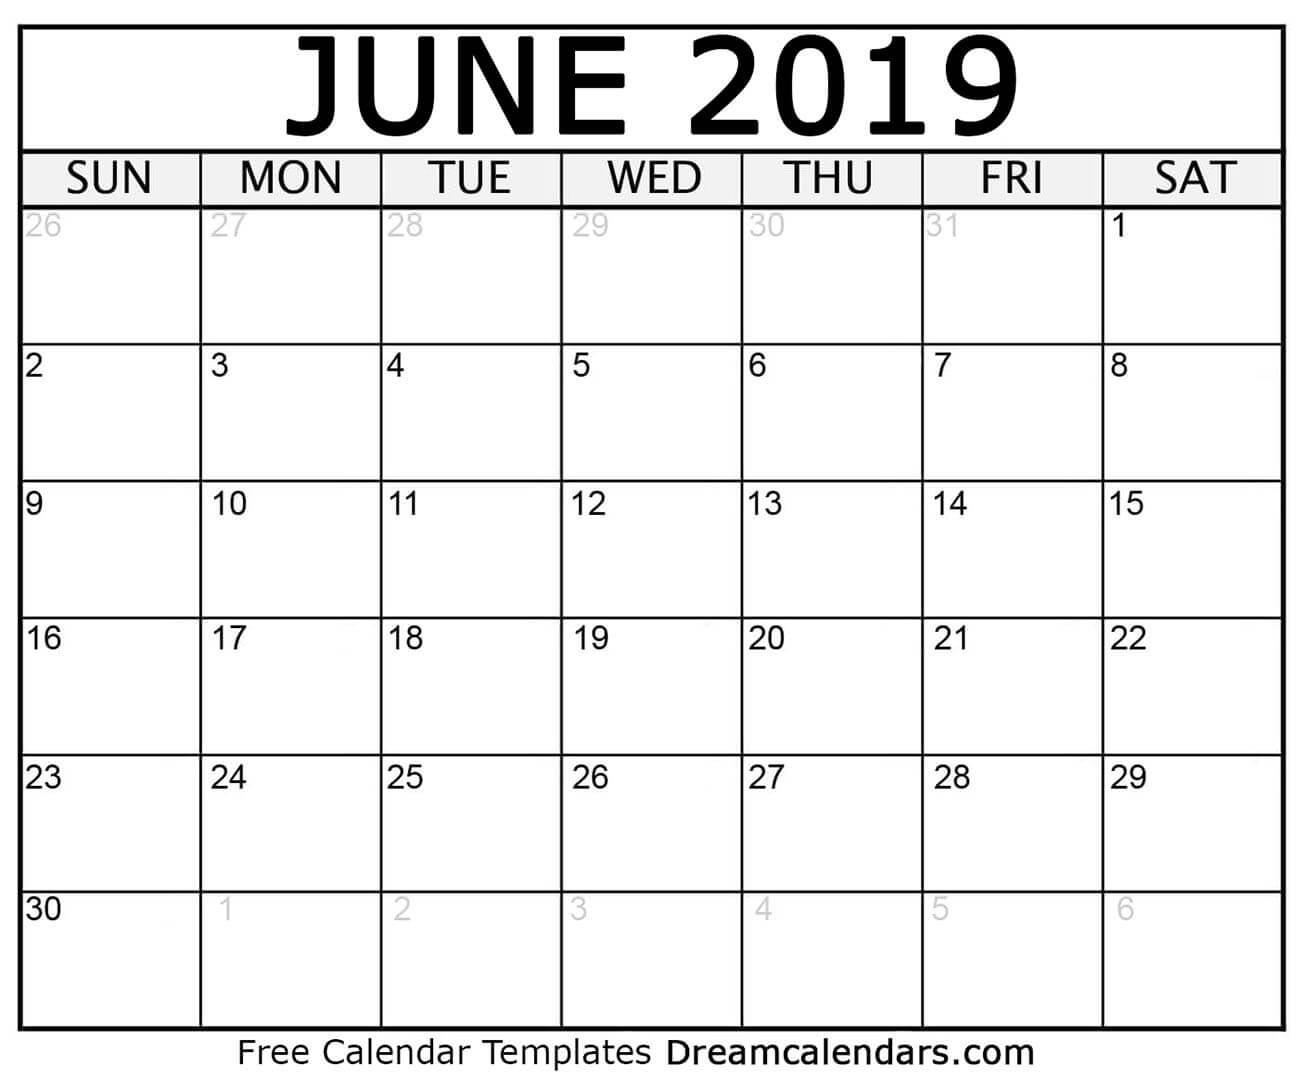 June 2019 Monthly Printable Calendar throughout June Calendar Printable Template